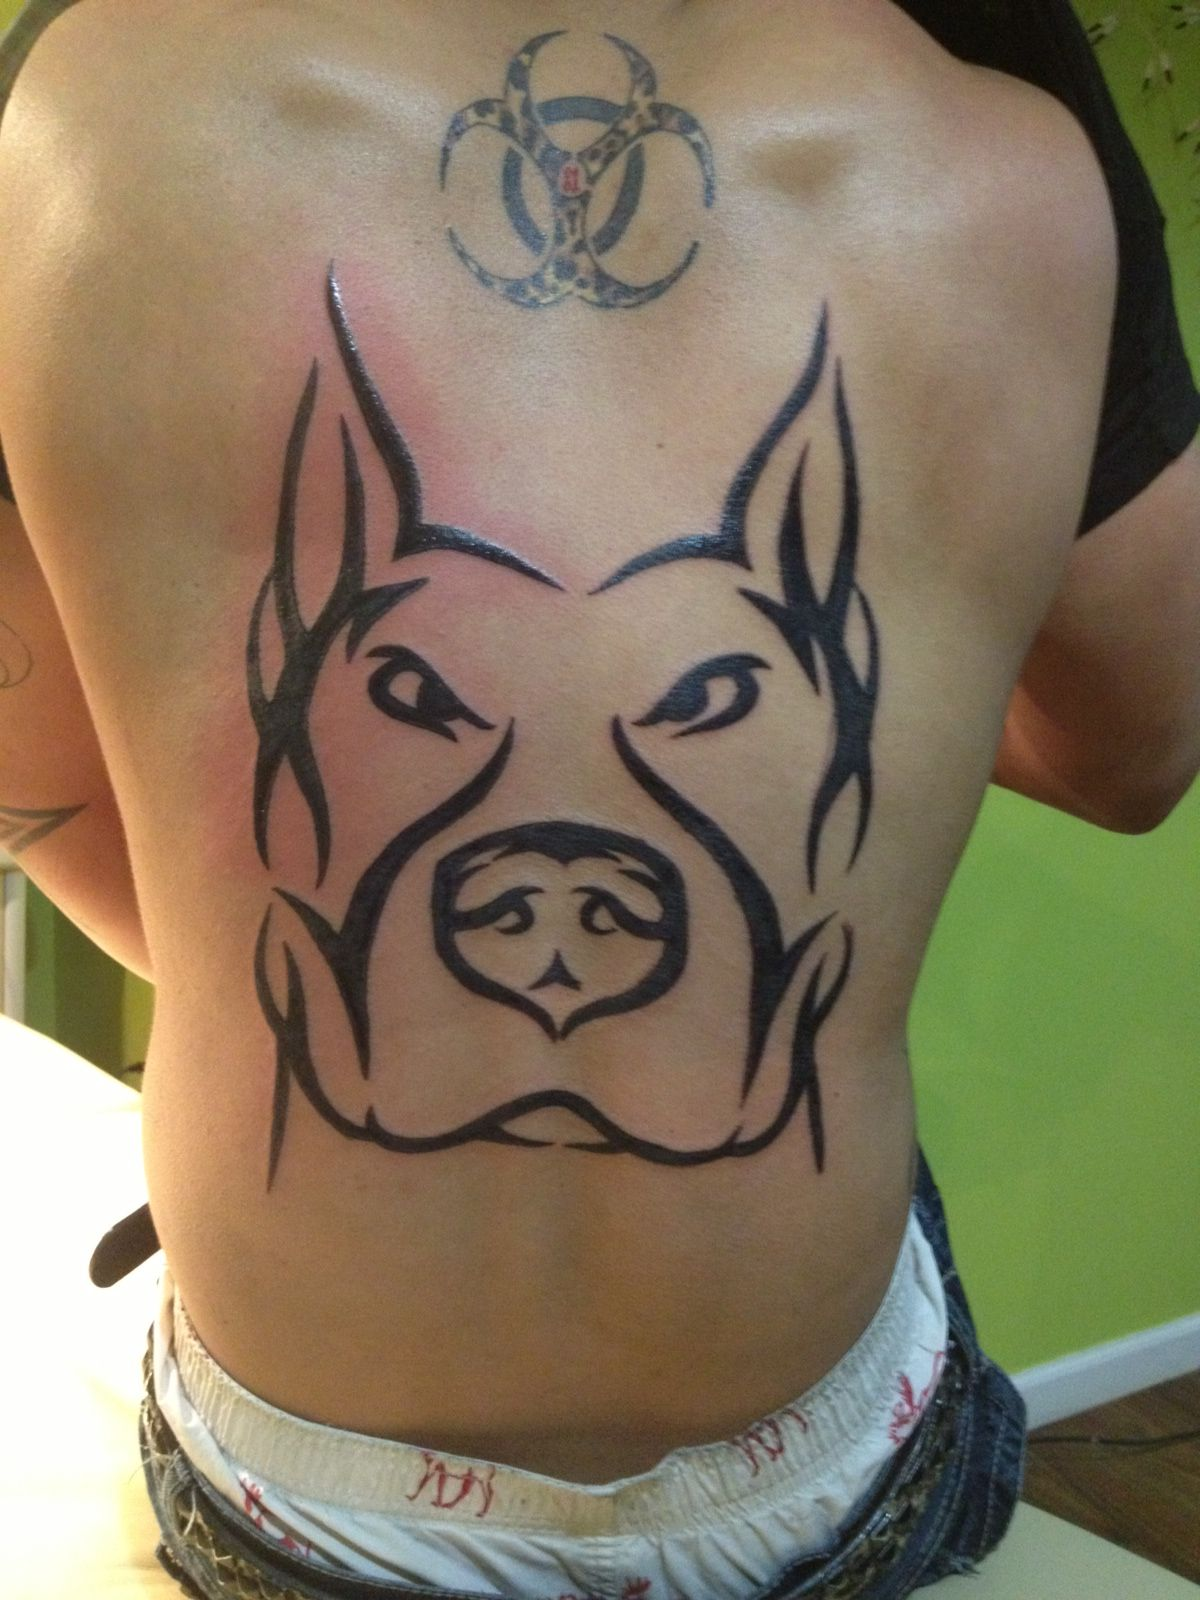 pitbull back tattoo cheetah print biohazard tattoo tat pinterest biohazard tattoo tattoo. Black Bedroom Furniture Sets. Home Design Ideas